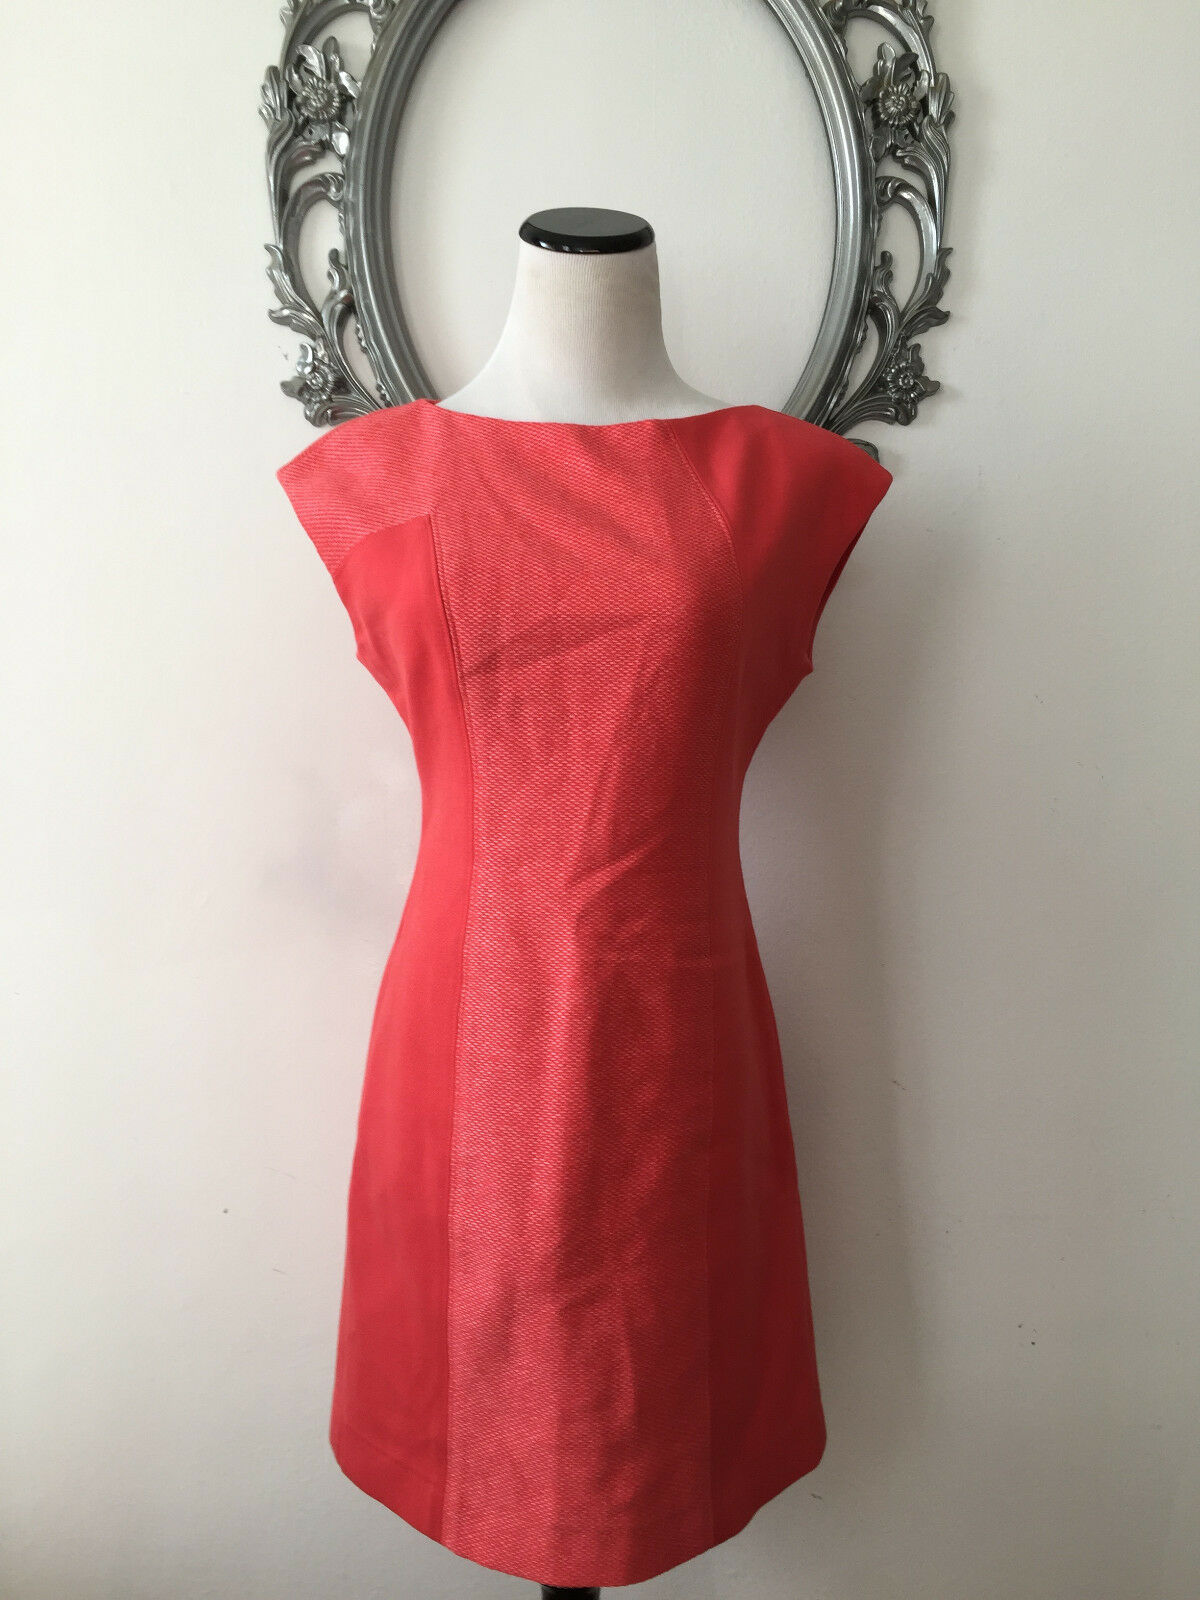 WORTH  Sleeveless Mini Dress Coral Farbe Cotton Blend New Größe 2 XS